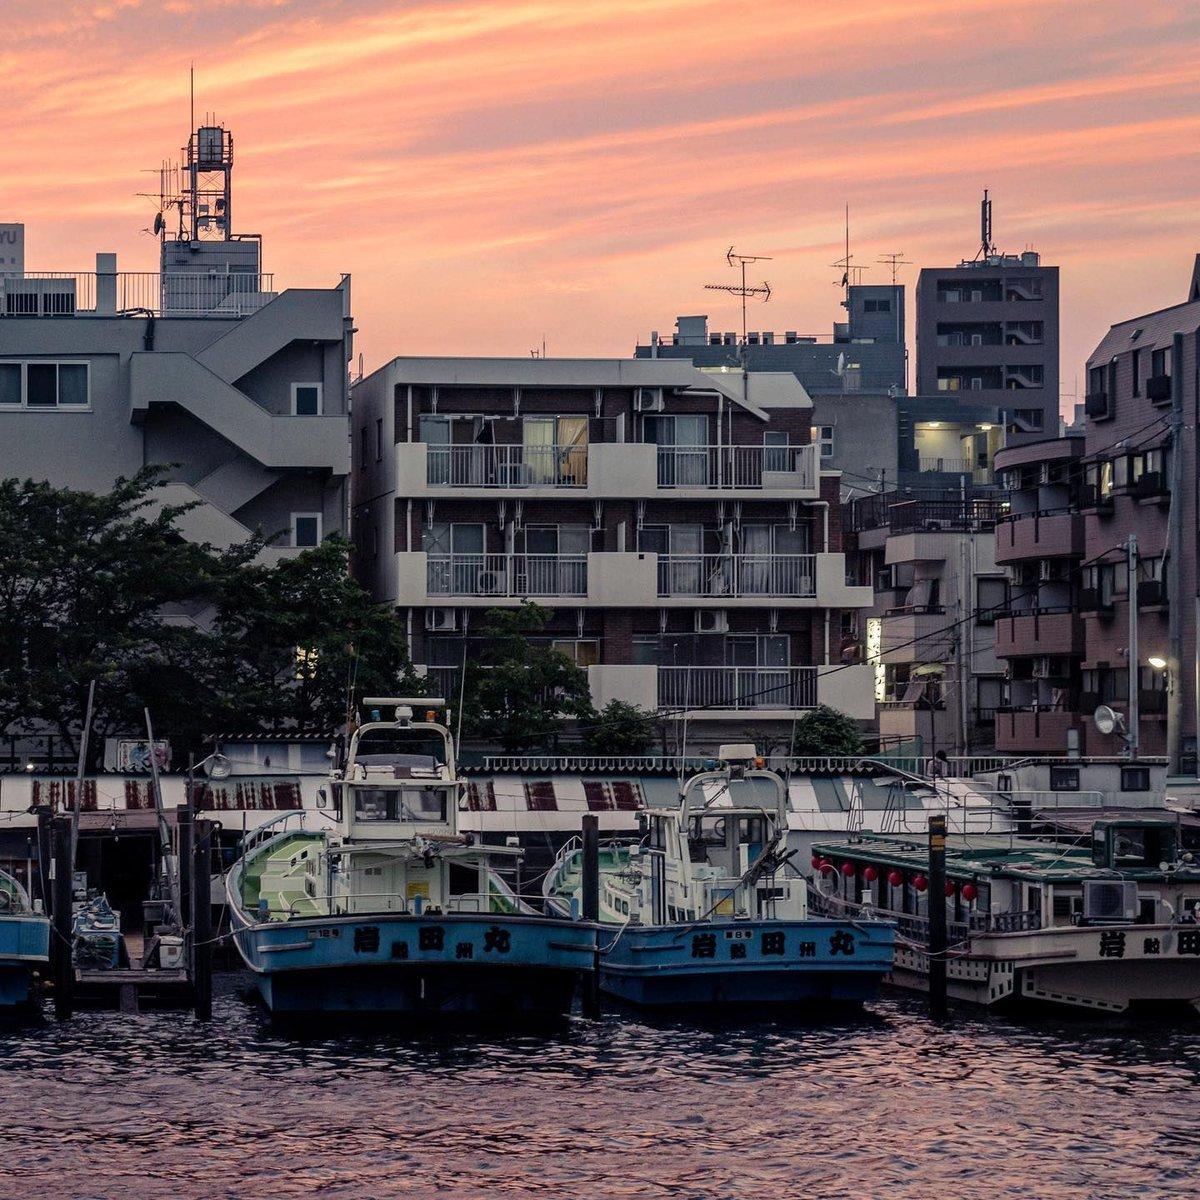 [Upload] https://instagr.am/p/CClWW16D22N/ Shinagawa, Tokyo. June 2020. 11024 https://sandman-kk.smugmug.com/2020/2020-07/i-bGxPLvJ… #streetphotographer #bestphoto_japan, #buildings #boat #river, #architectures #dailyphotography #instajapan #igtravelworld #japan_daytime_view #japantrip #street…pic.twitter.com/bYClr07OaB